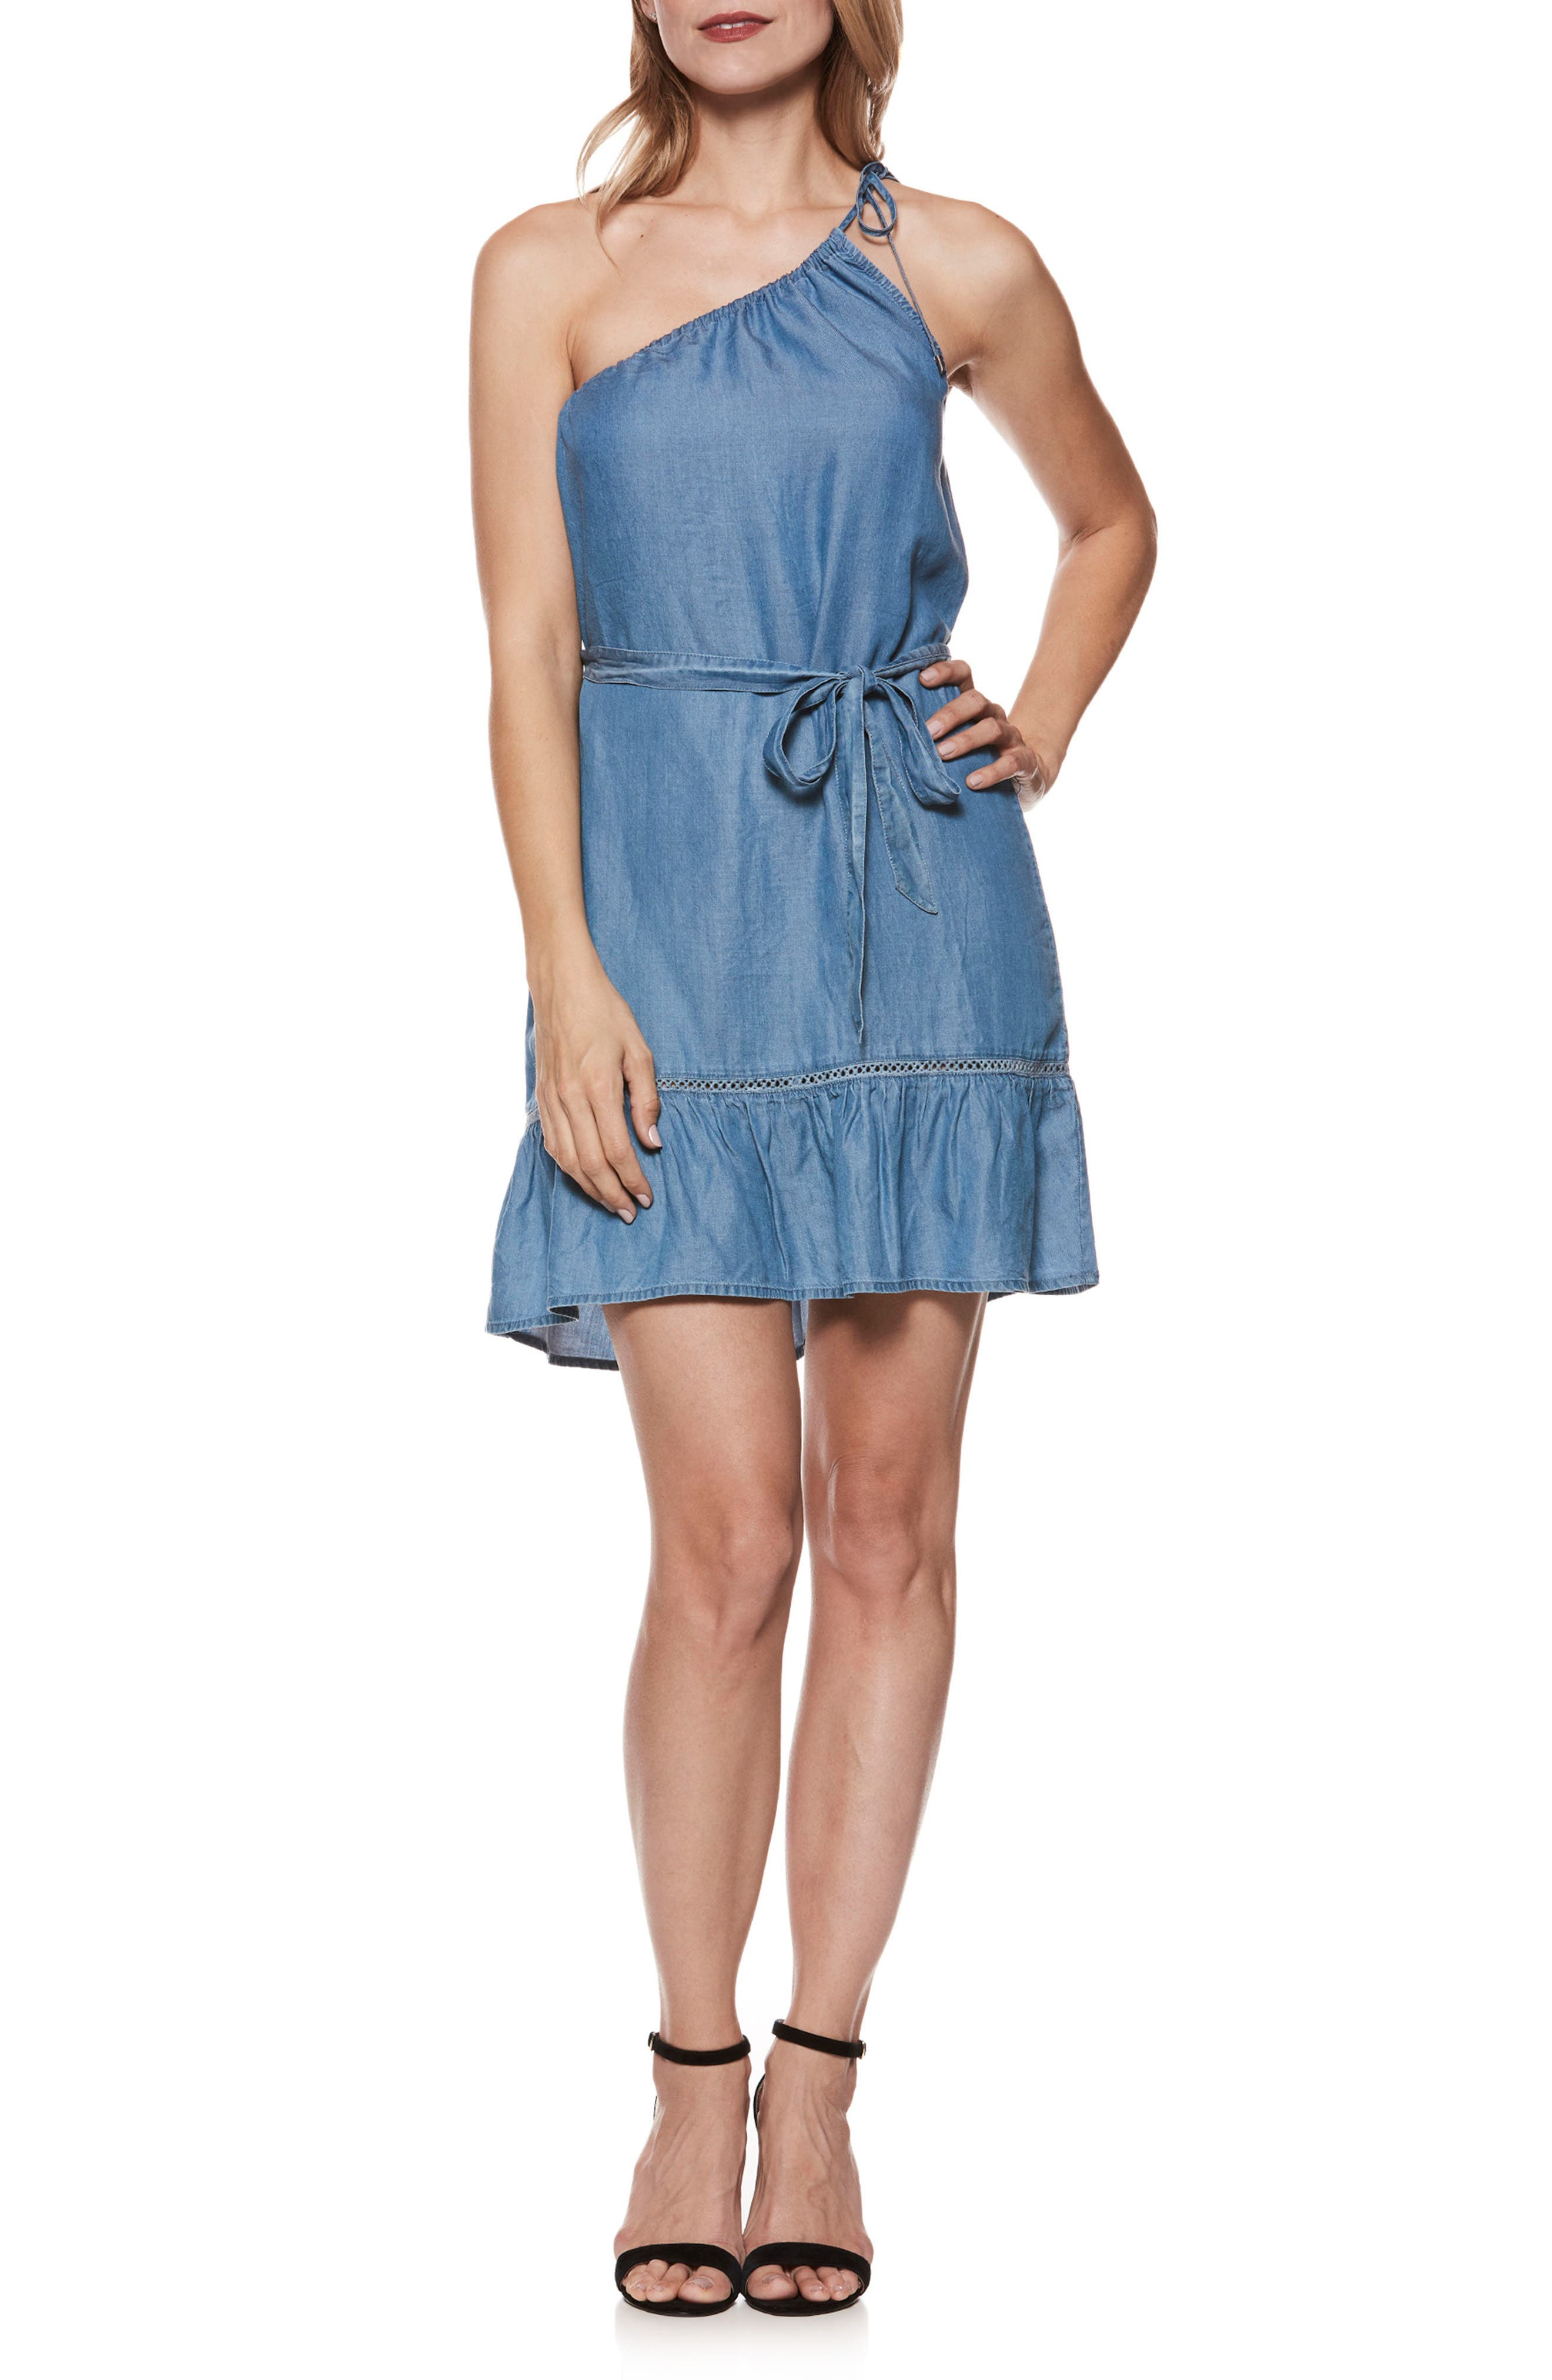 Lauretta Dress,                             Main thumbnail 1, color,                             400